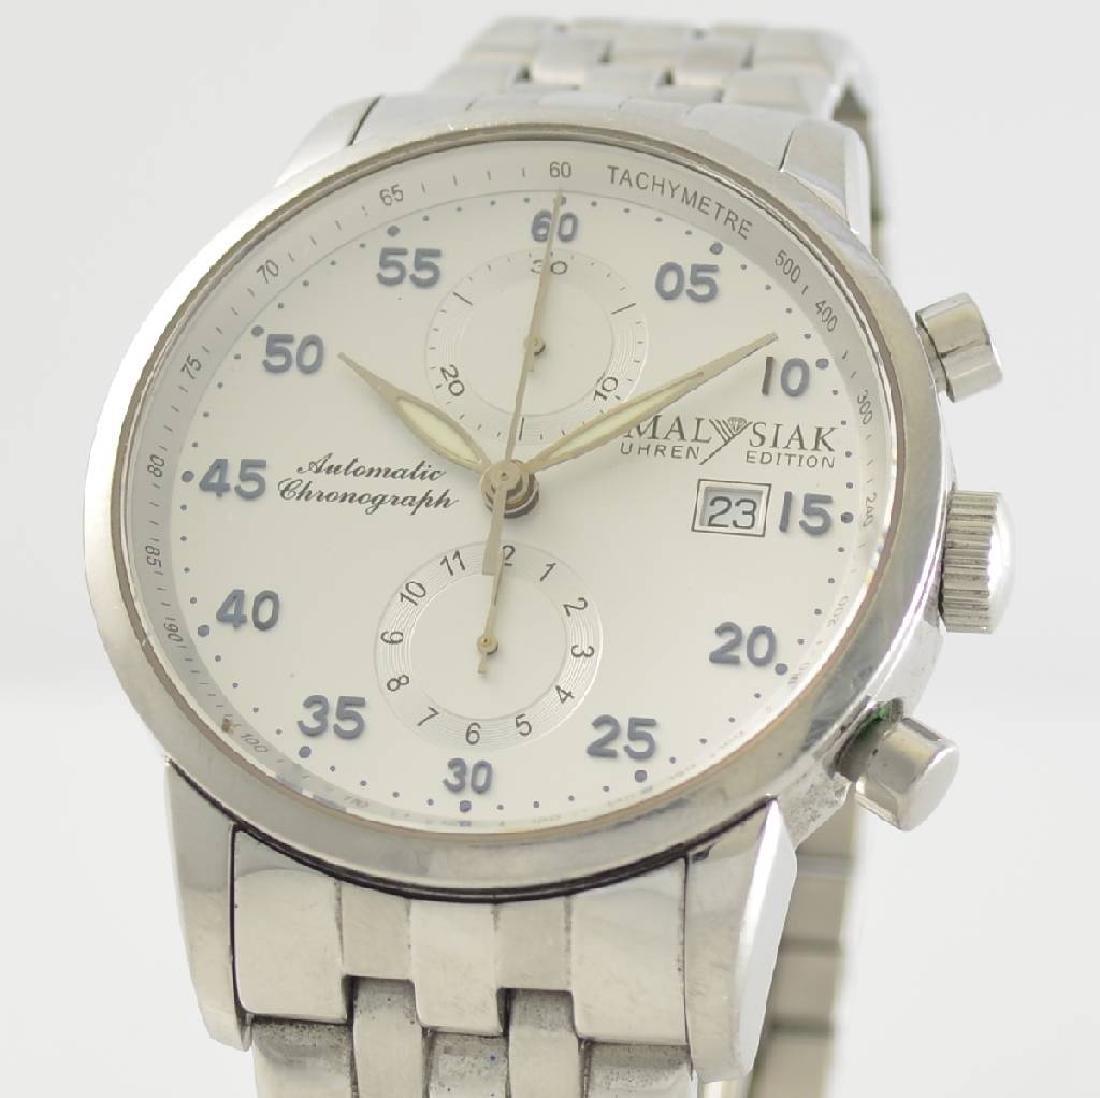 MALYSIAK Uhren Edition self winding chronograph - 4